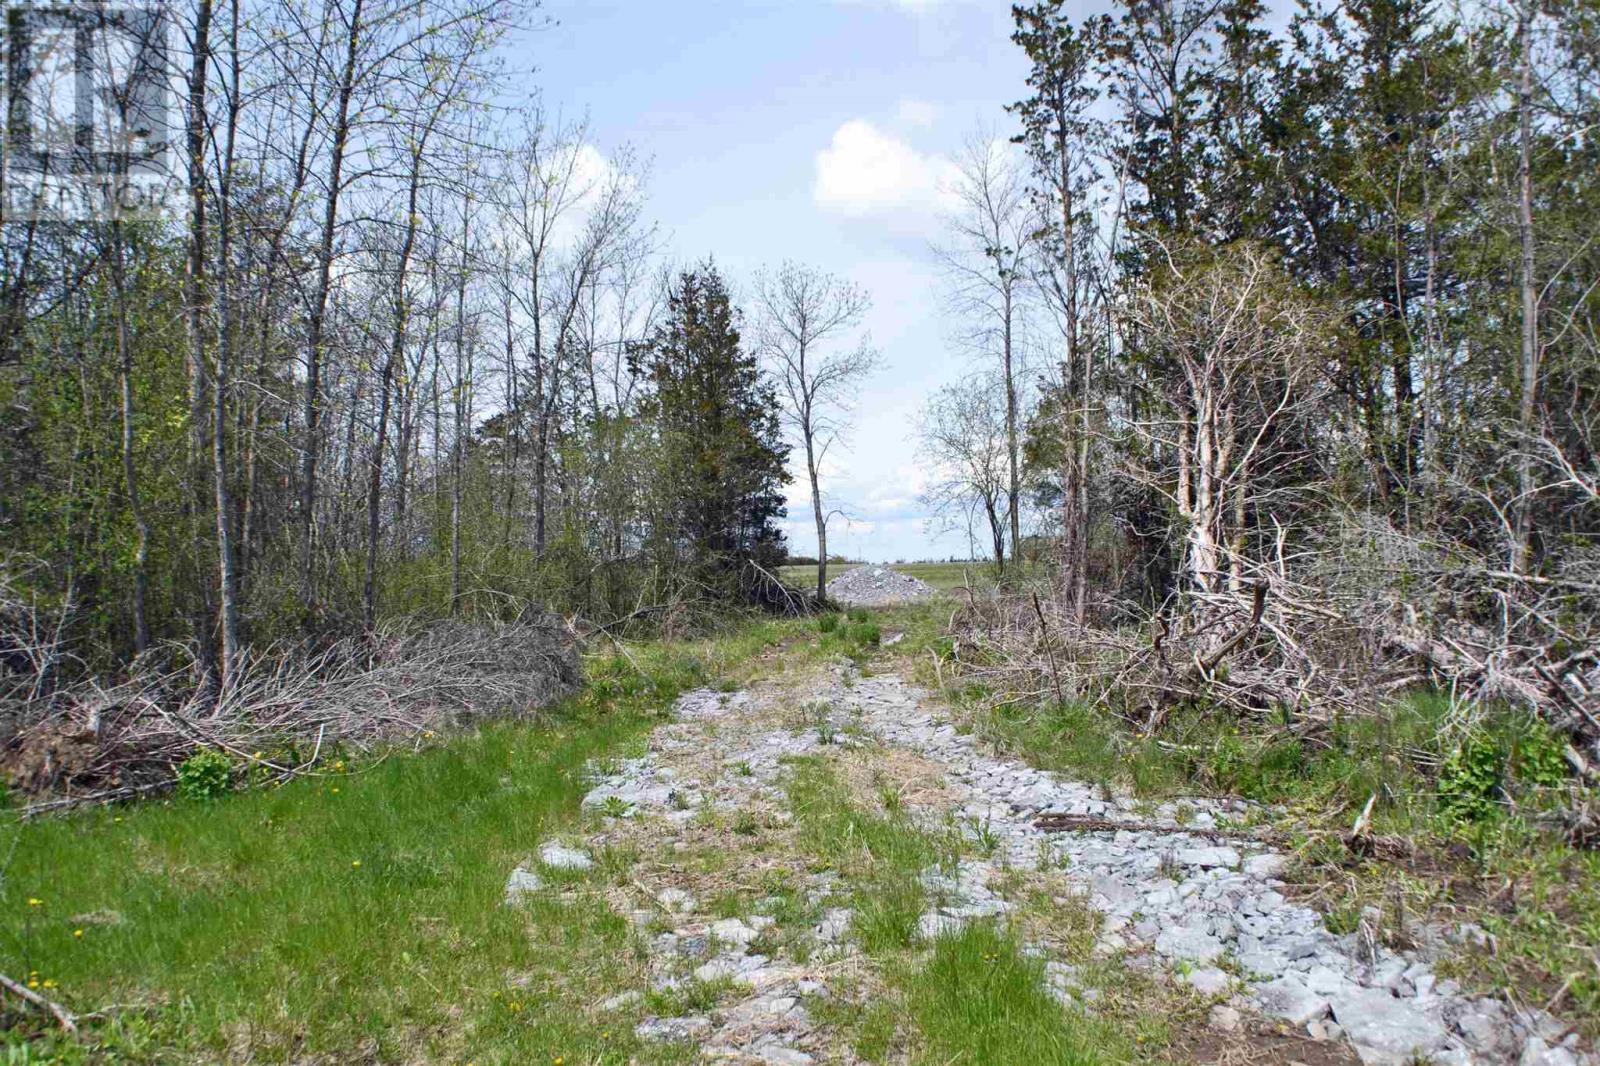 0 COUNTY ROAD 9, greater napanee, Ontario